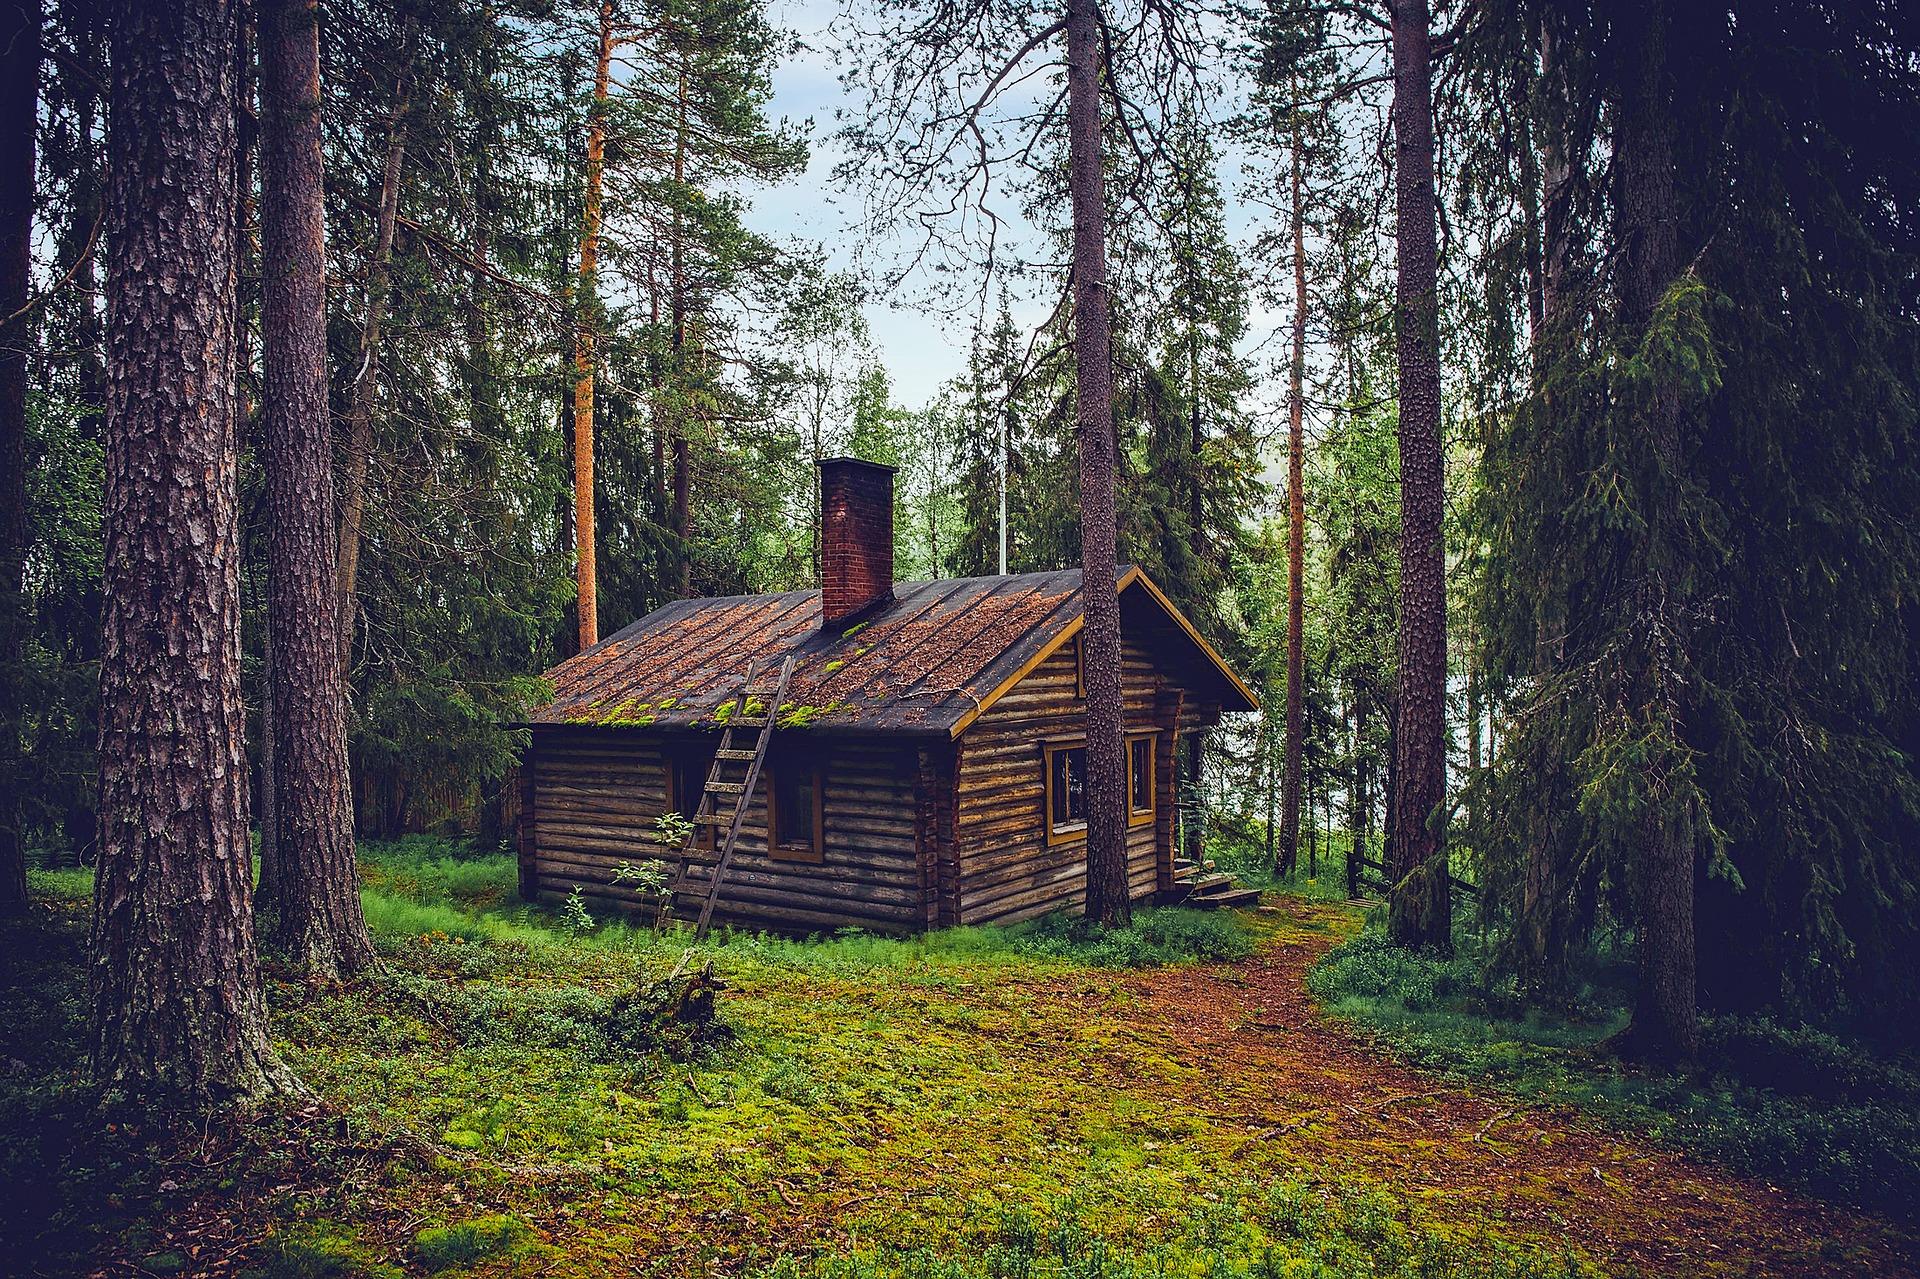 A Log Cabin in Finland